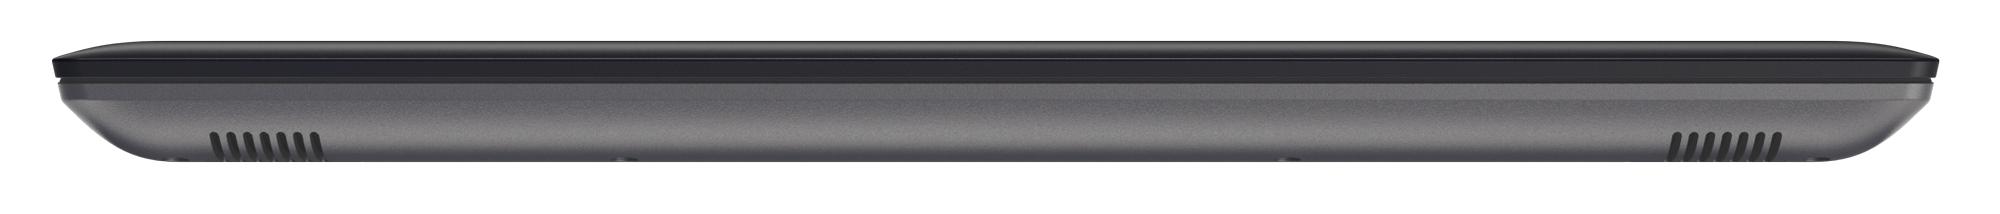 Фото  Ноутбук Lenovo ideapad 320-14IAP Onyx Black (80XQ007ARA)